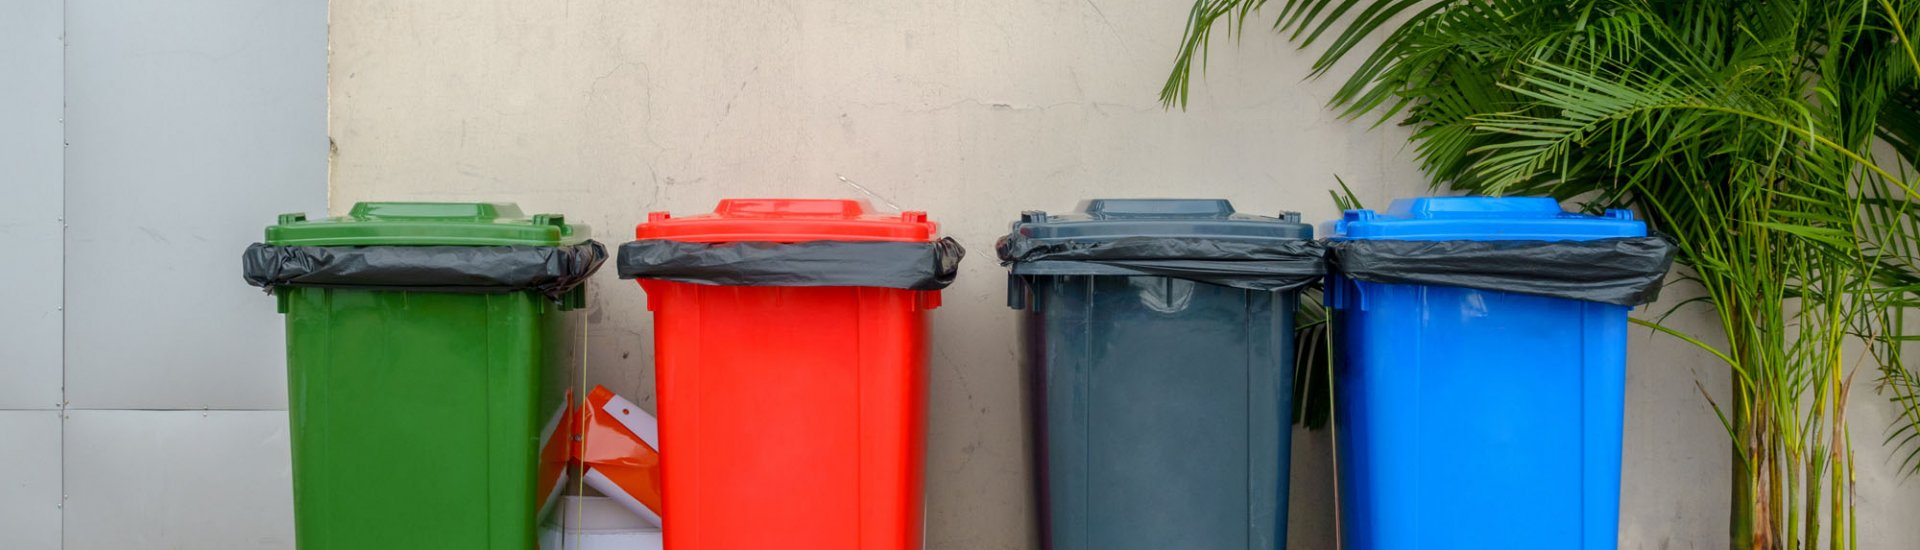 Mülltonnen: Top 3 Modelle, richtige Mülltrennung